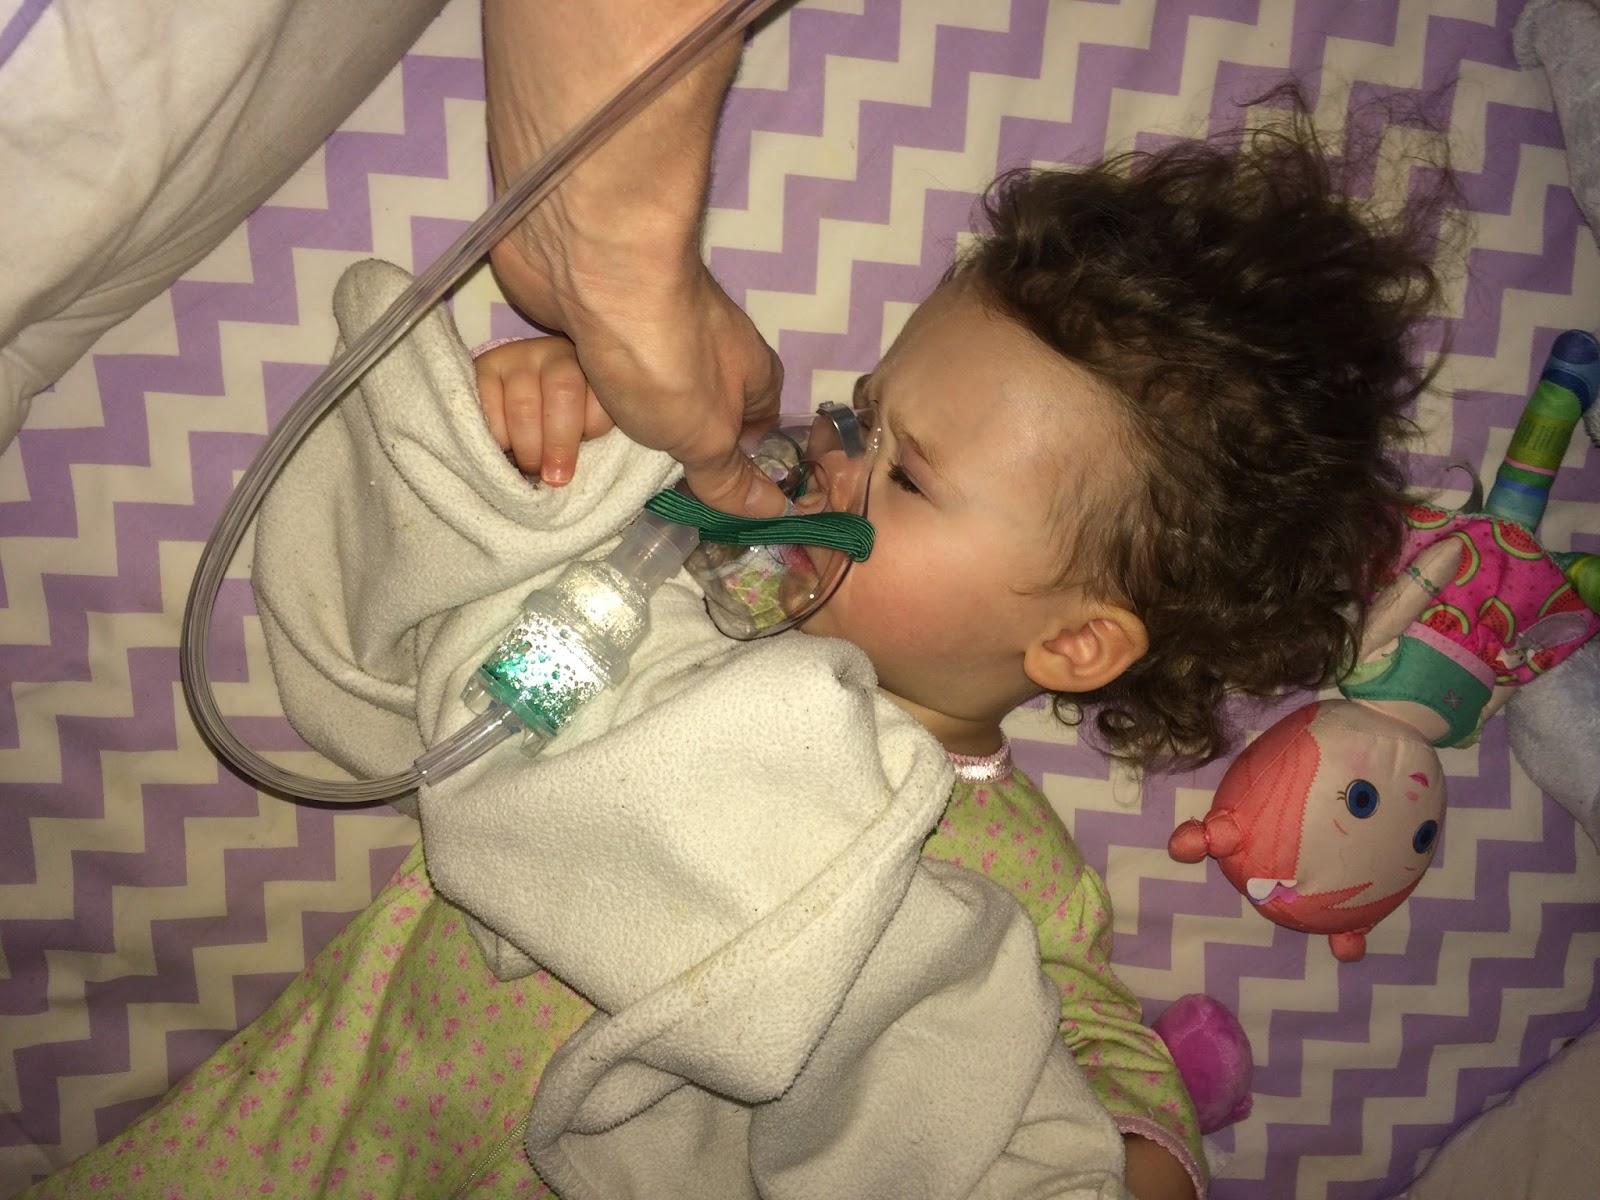 breathing treatment machine walmart